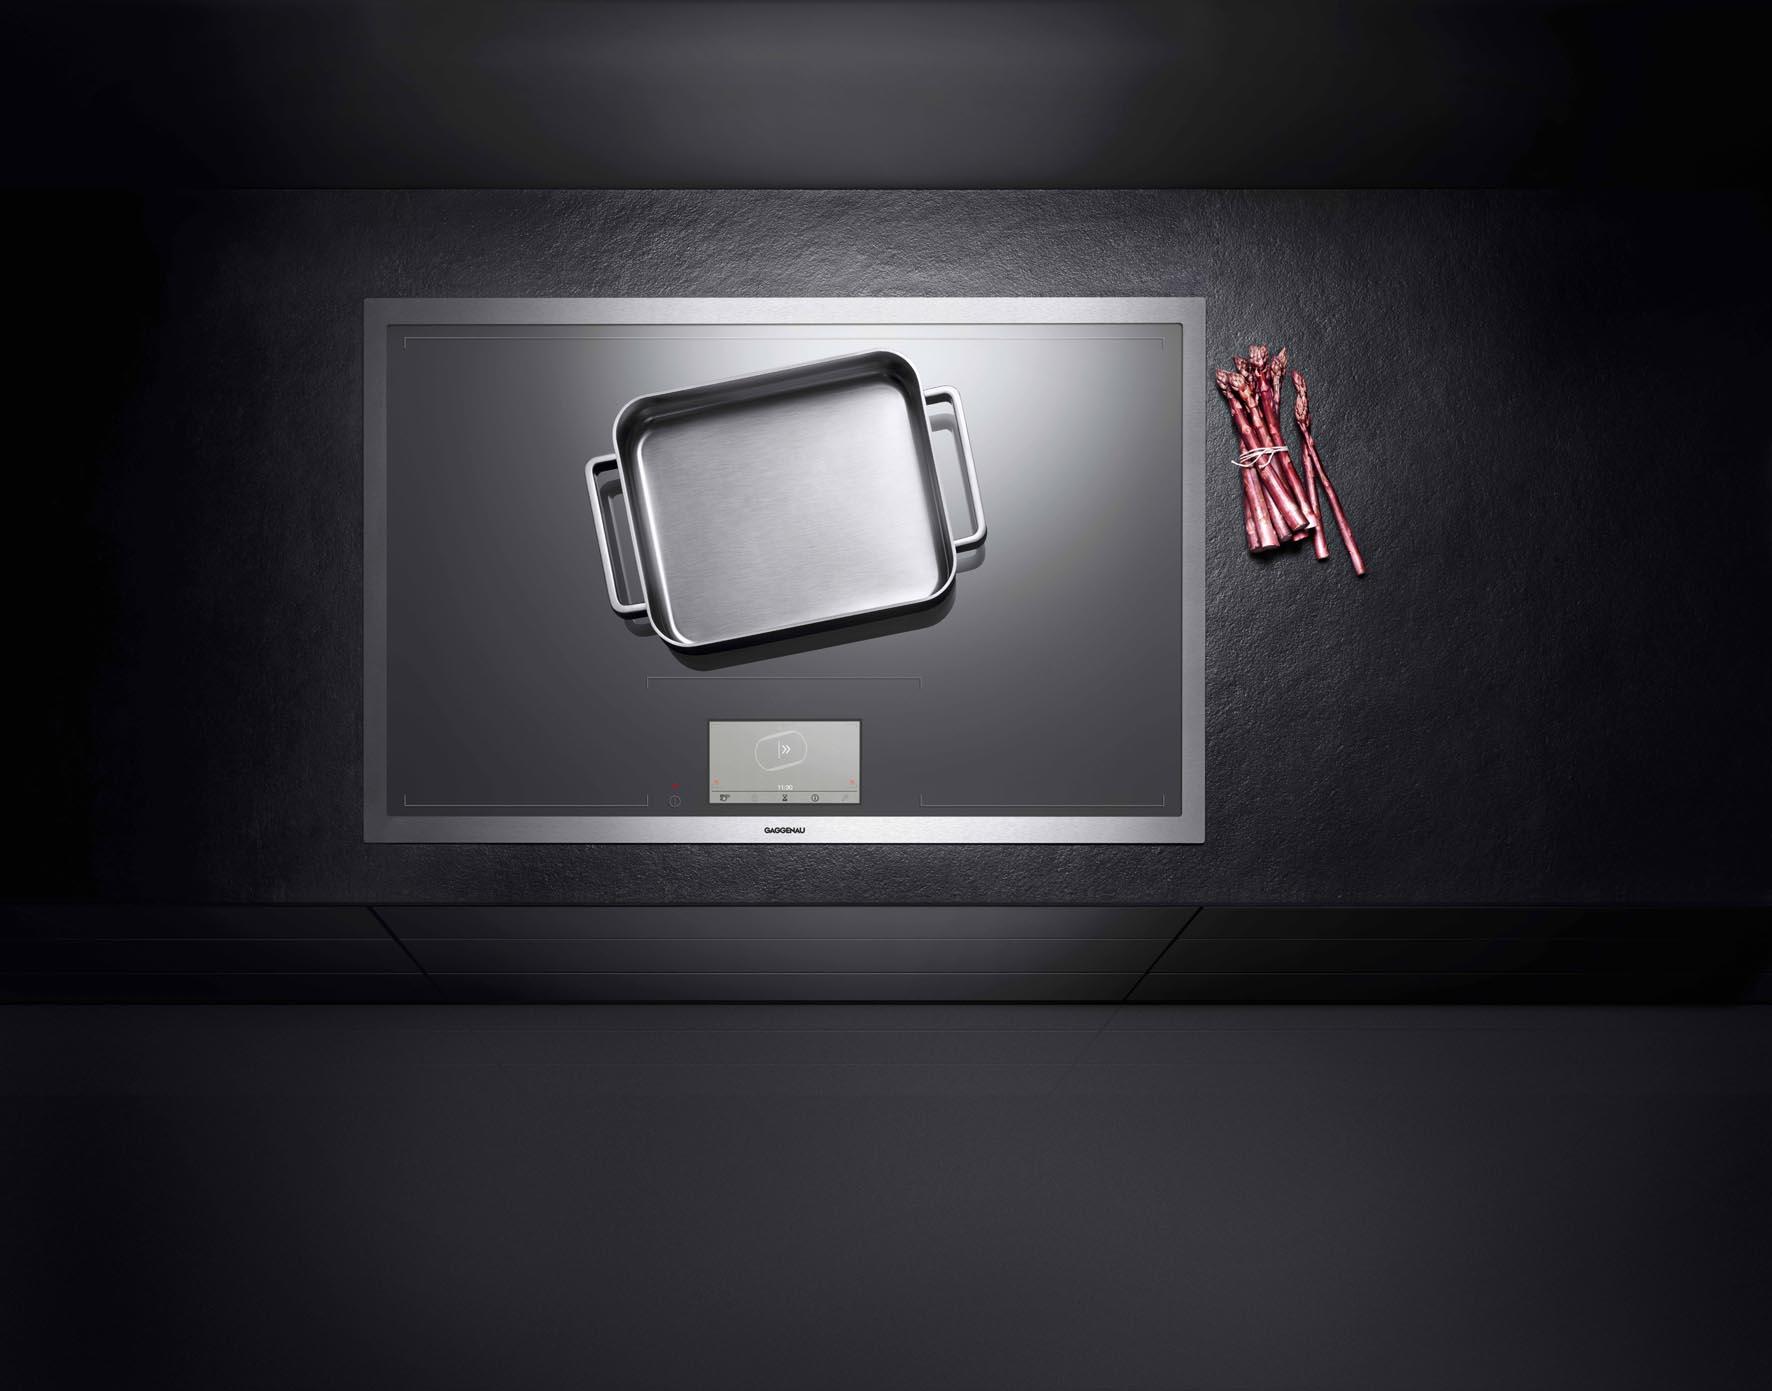 gaggenau cx 480 cooktop the kitchen and bathroom blog. Black Bedroom Furniture Sets. Home Design Ideas